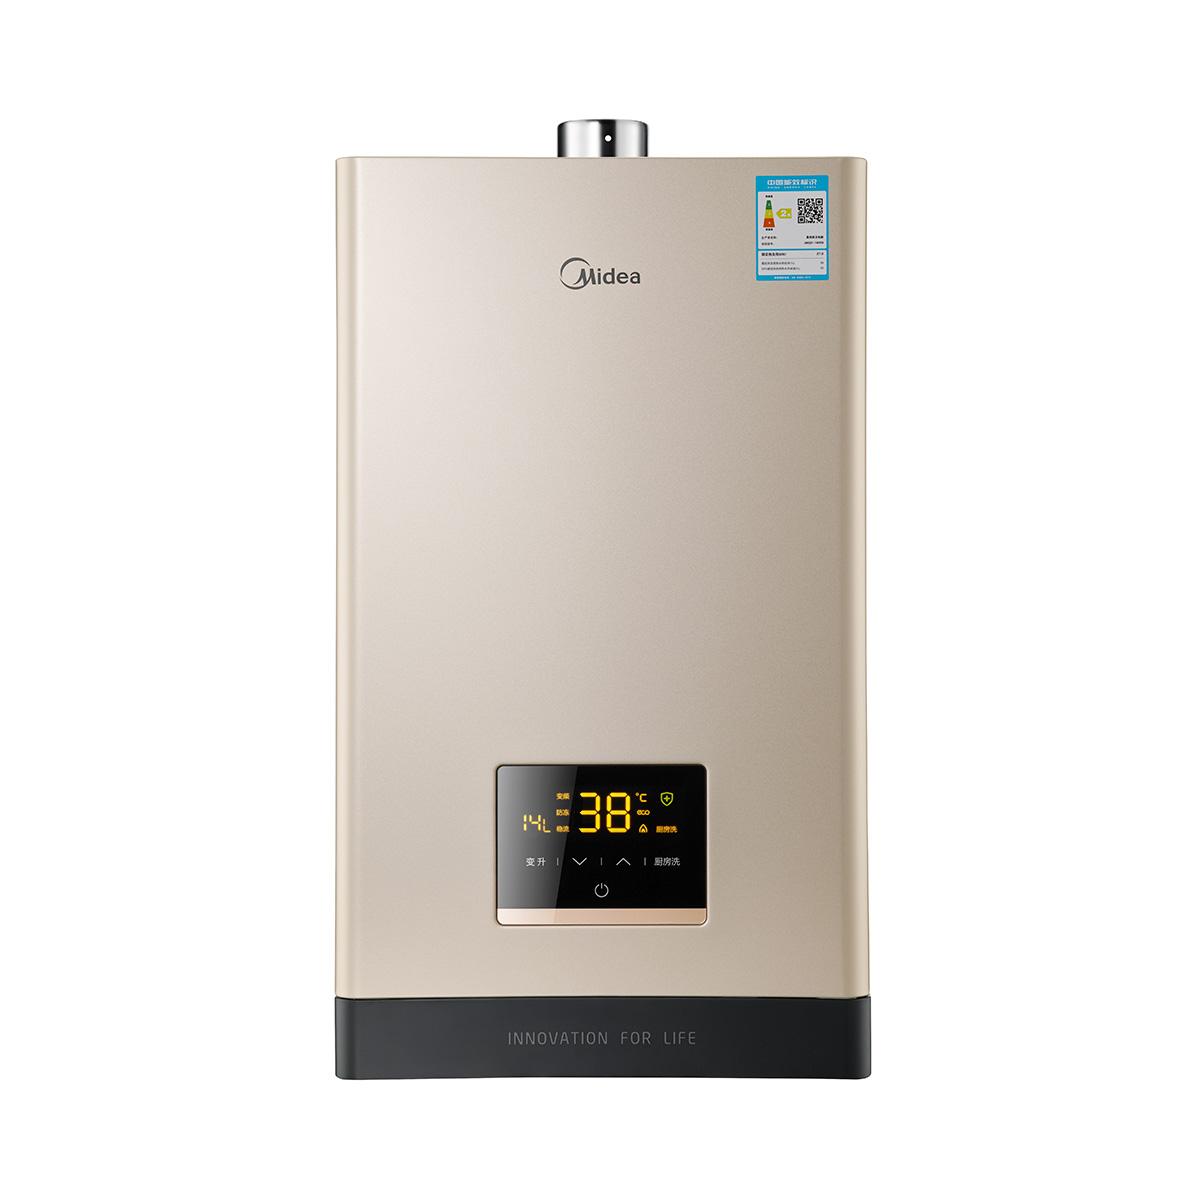 Midea/美的 JSQ27-14HC6(T) 防冻燃气热水器 说明书.pdf